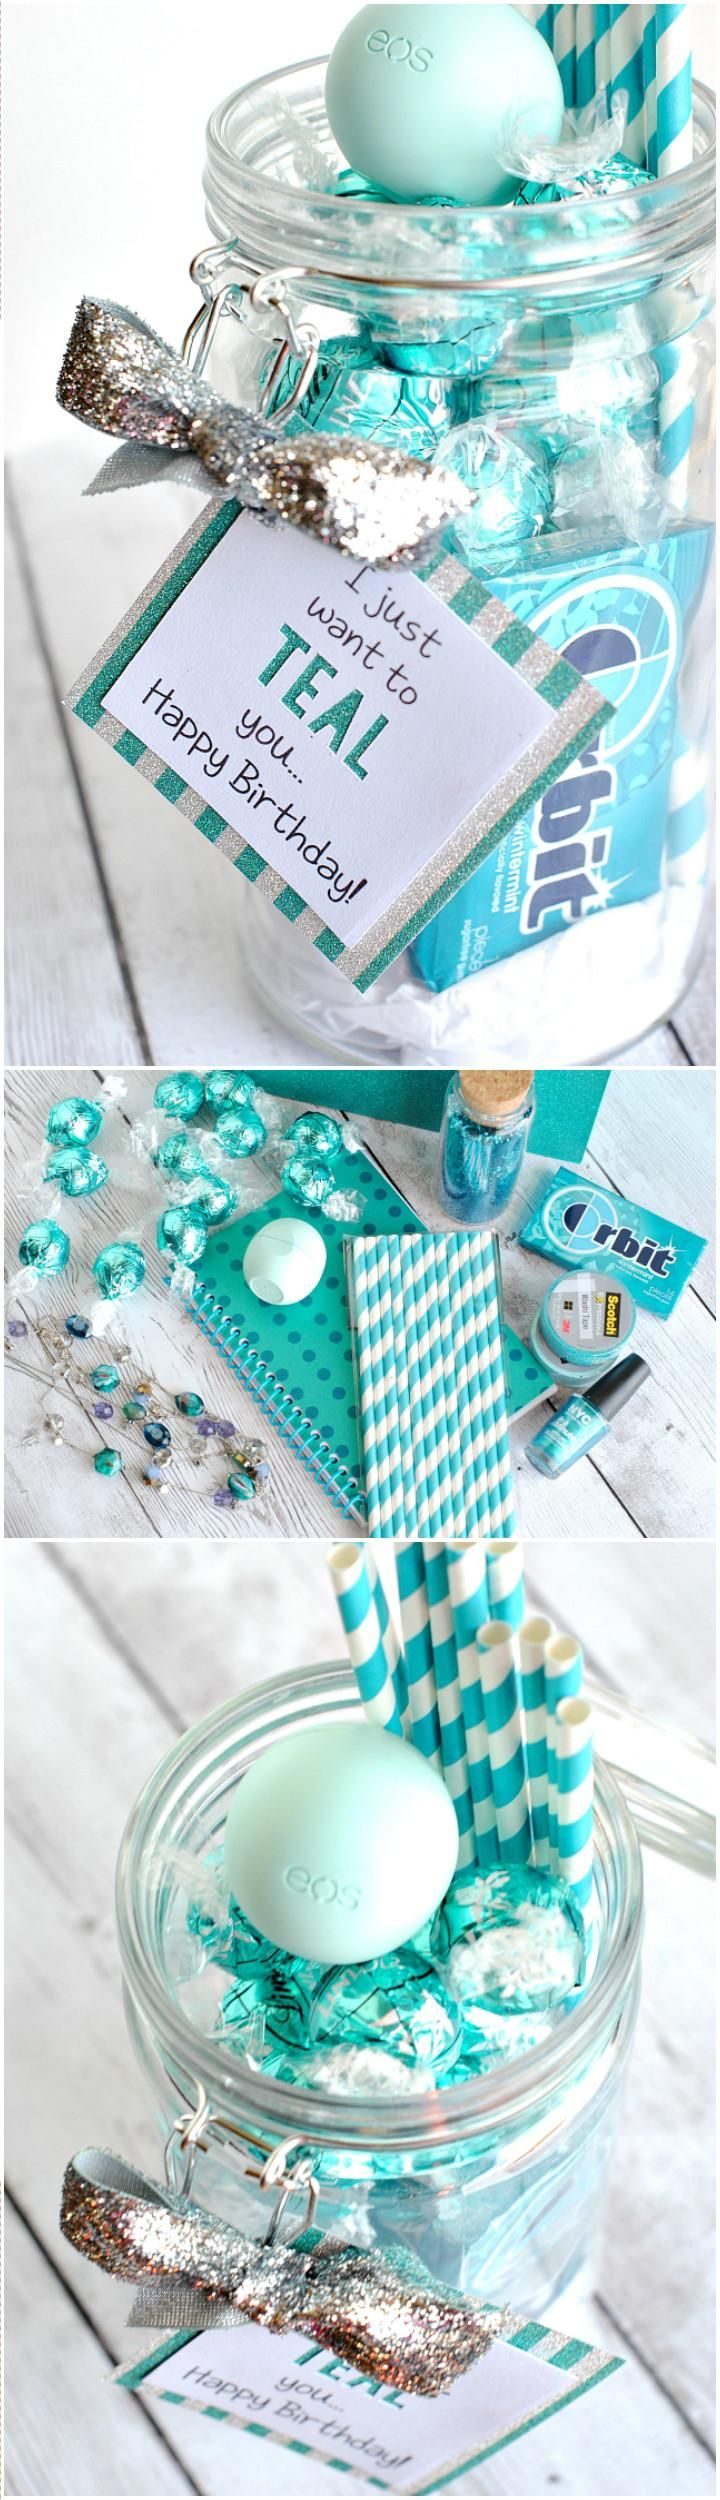 70+ Inexpensive DIY Gift Basket Ideas - DIY Gifts - Page 6 of 14 - DIY & Crafts